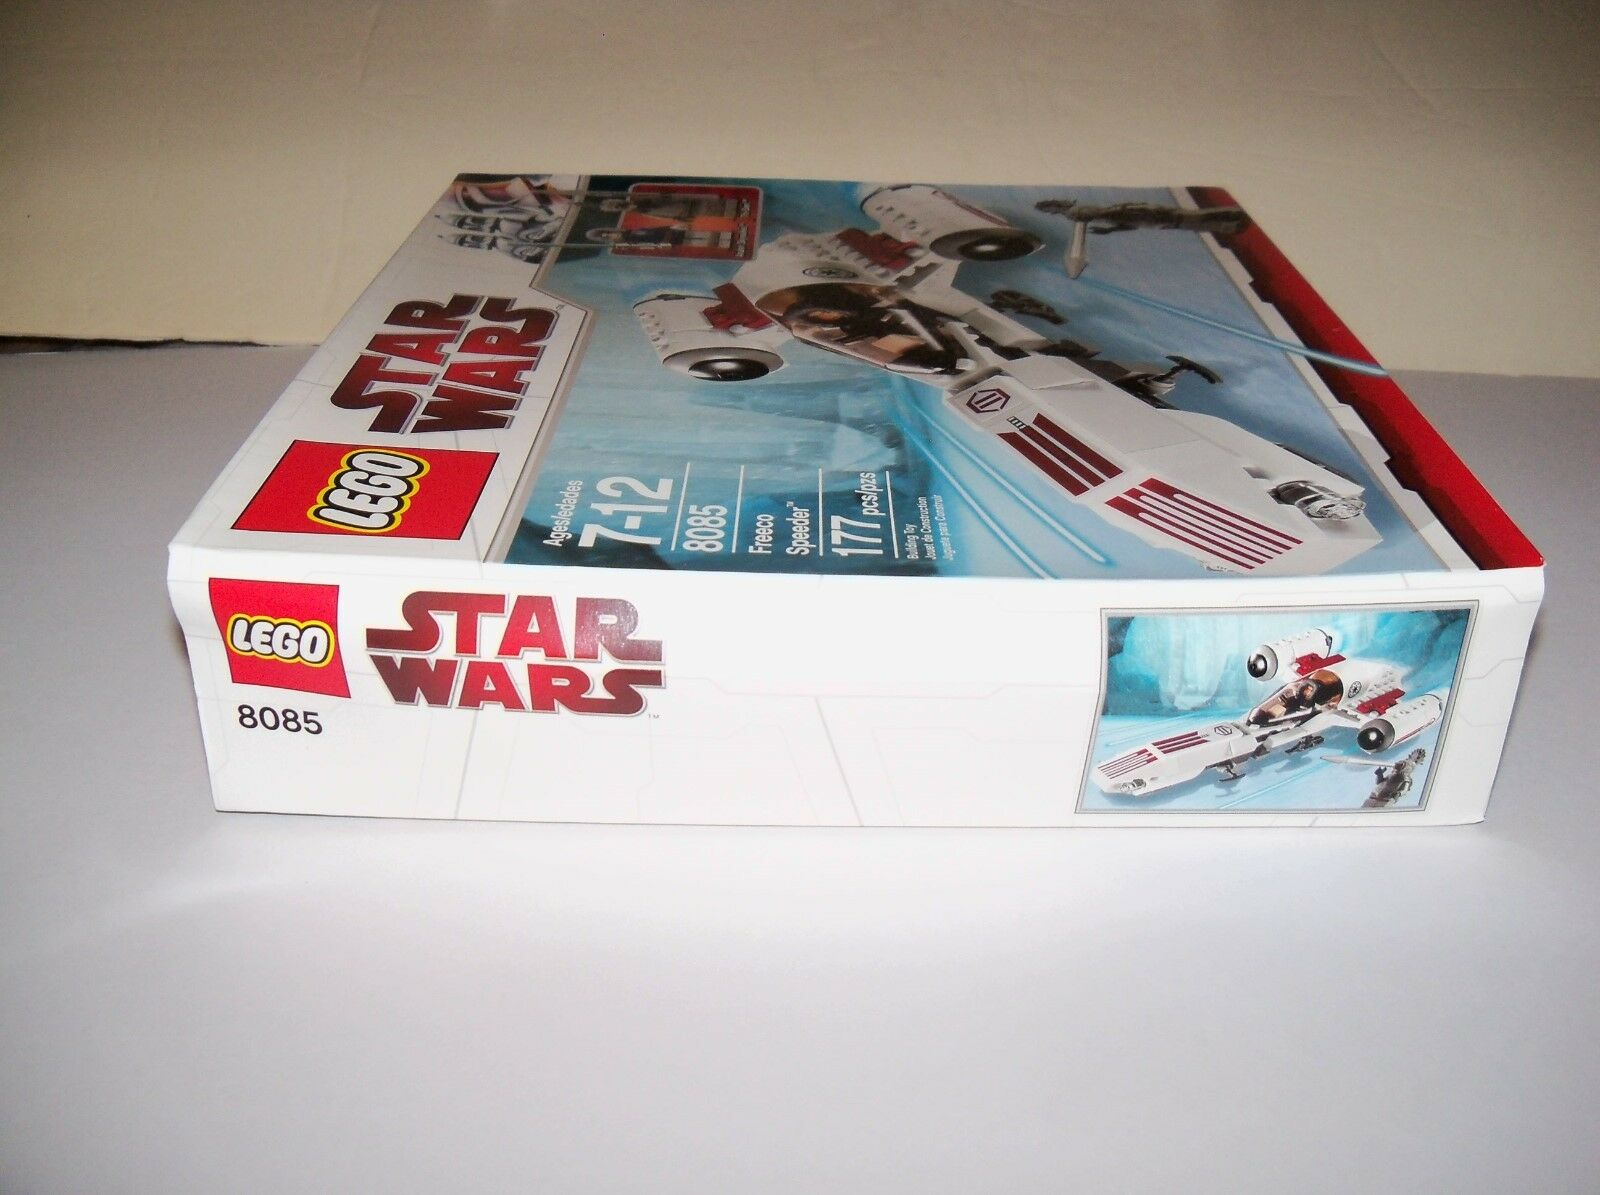 Retired new LEGO LEGO LEGO Star Wars 8085 Anakin Skywalker FREECO SPEEDER Clone Wars set a168ab